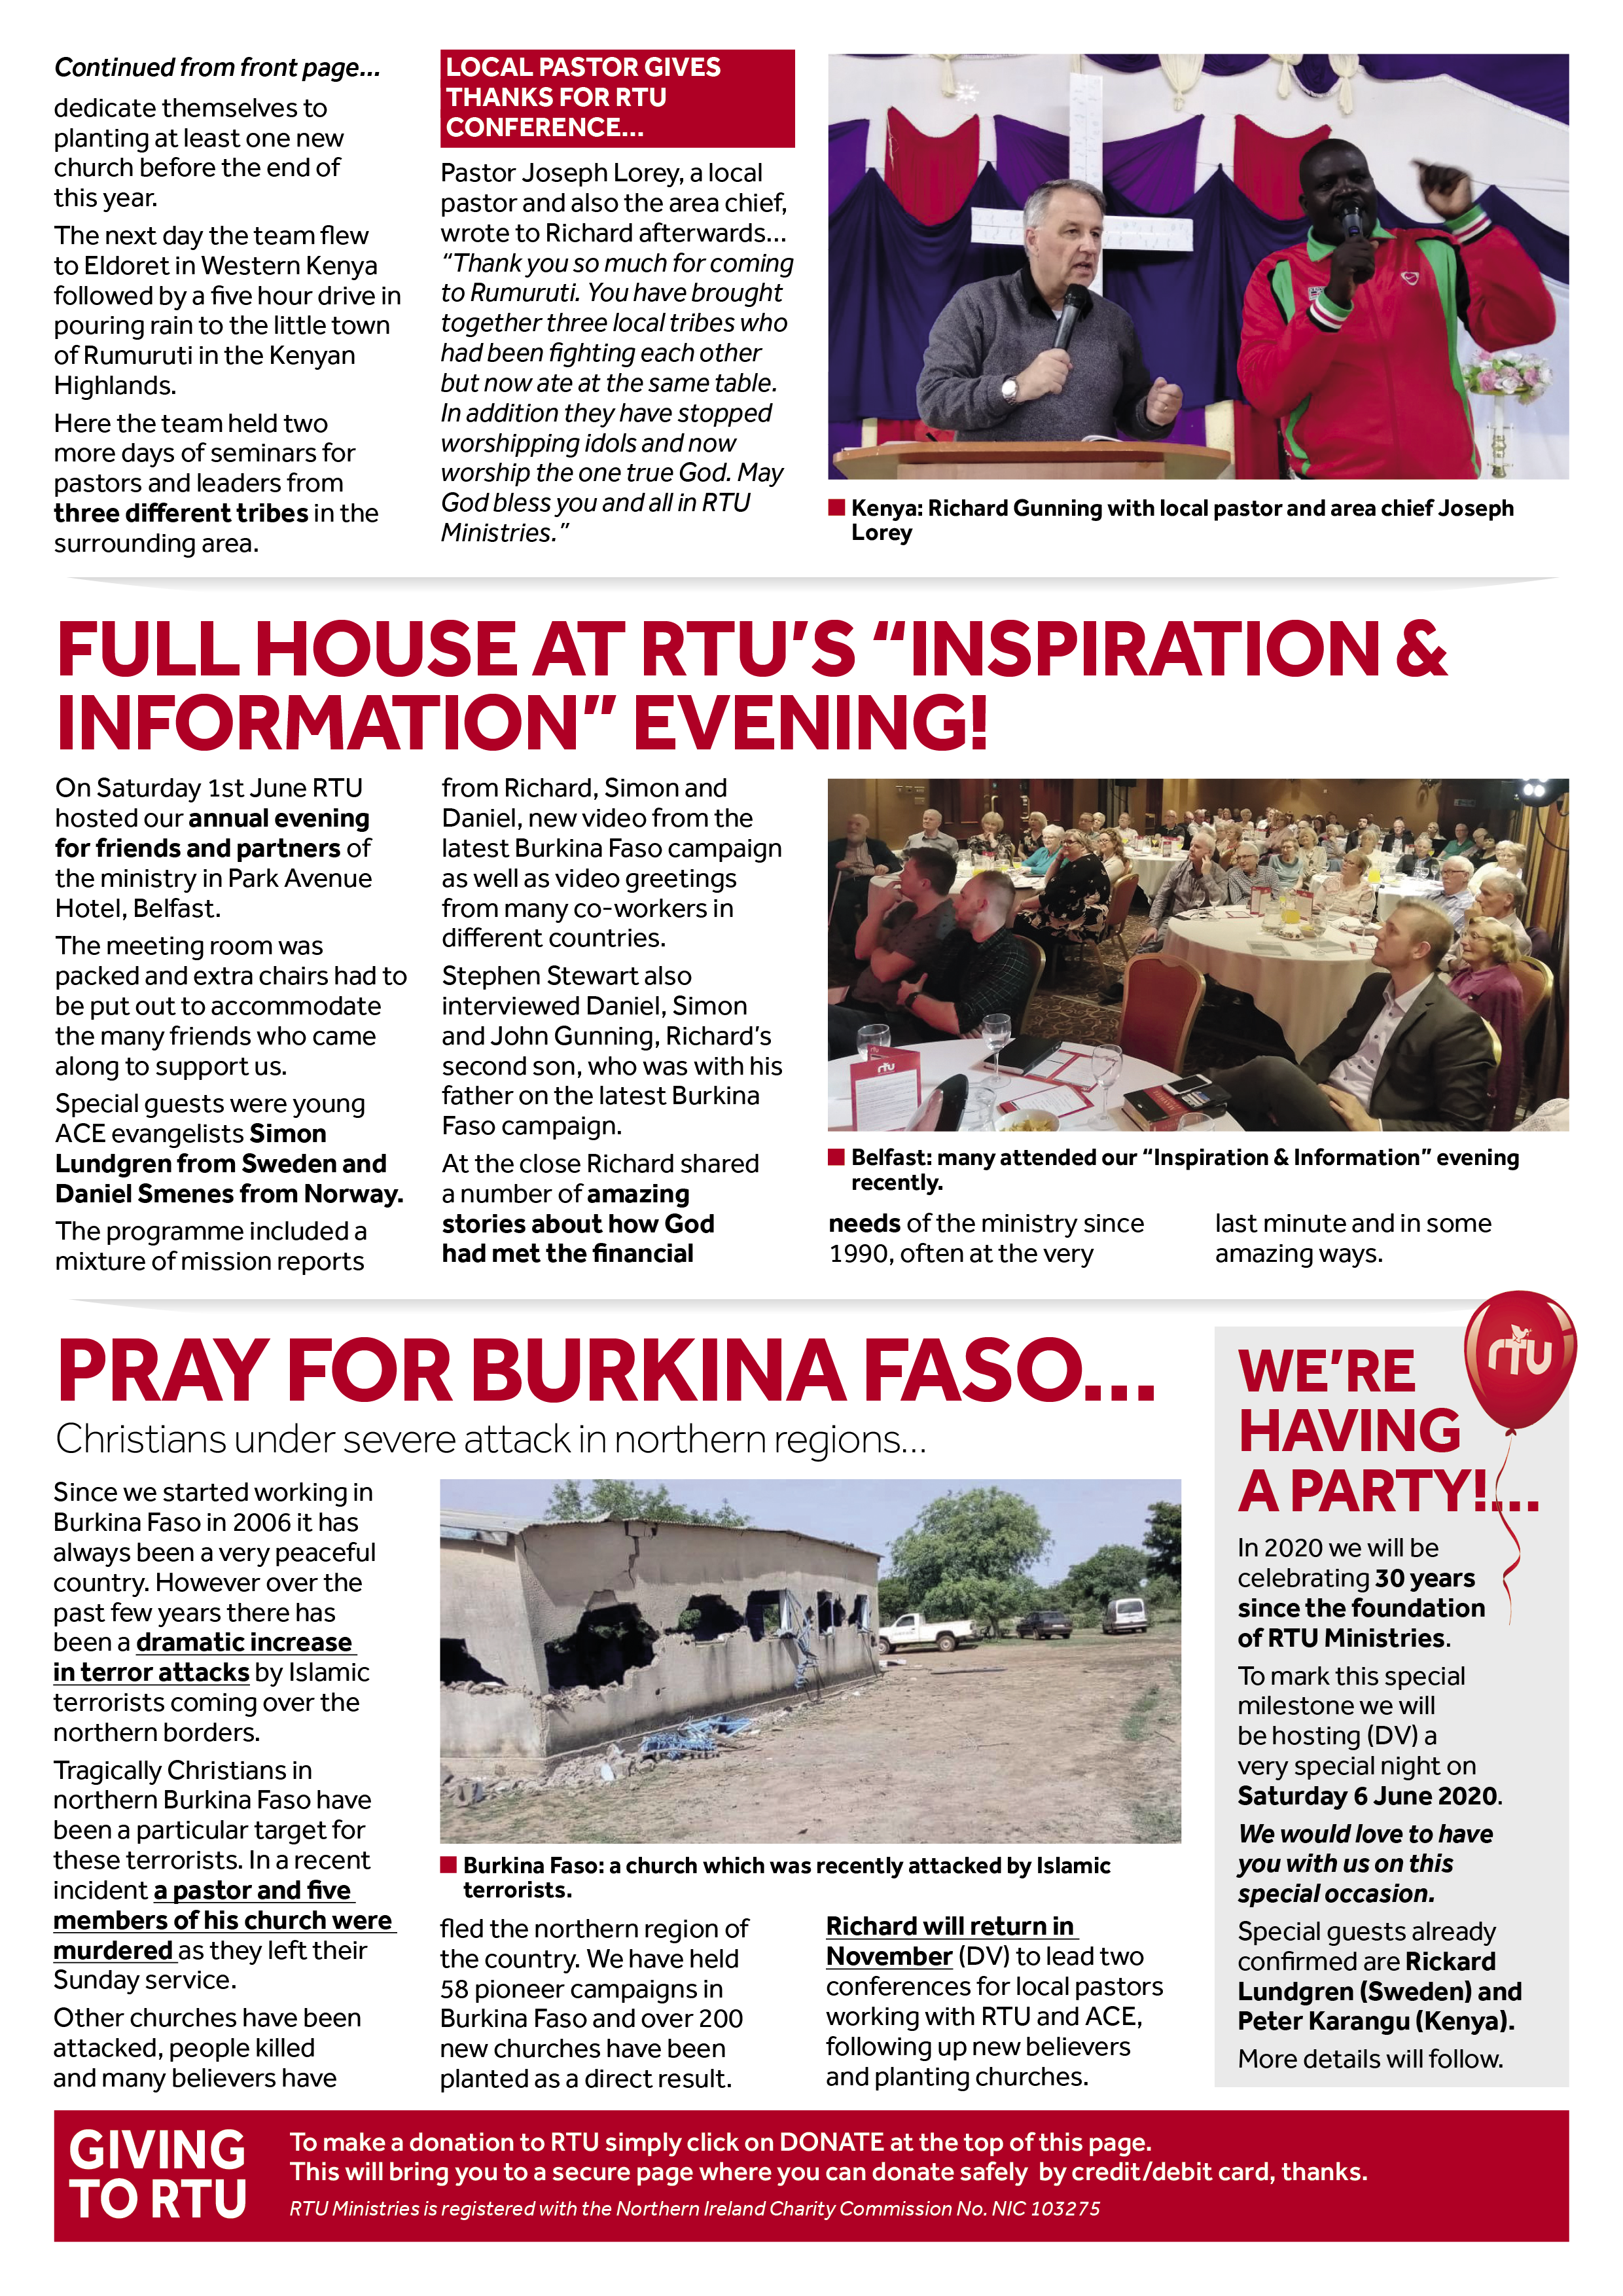 022930 - RTU June 2019 Newsletter2.png